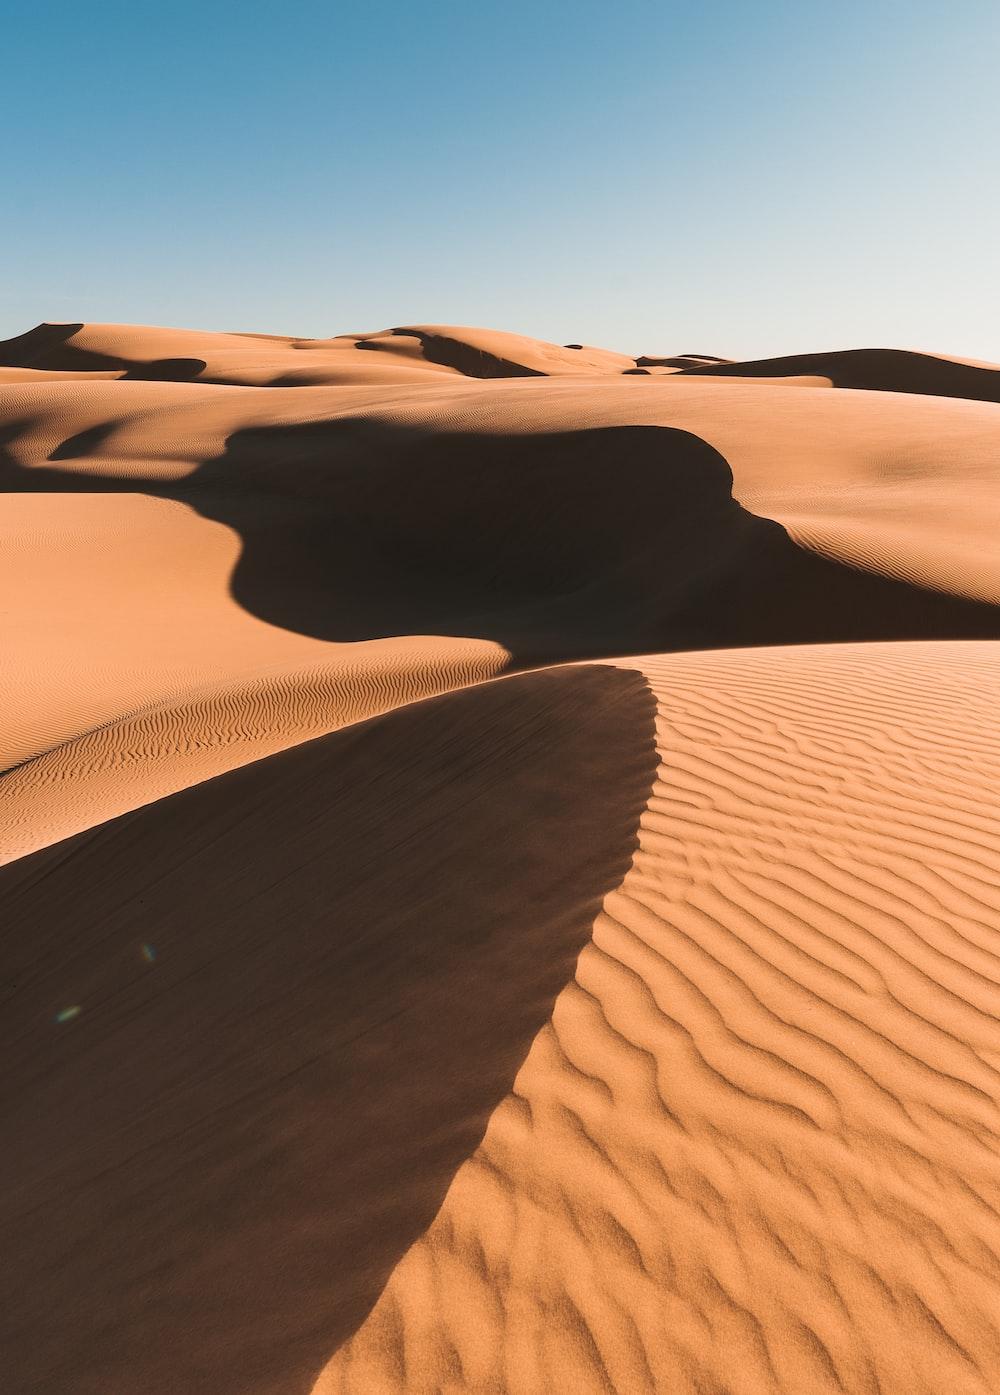 brown sand dunes under blue sky during daytime